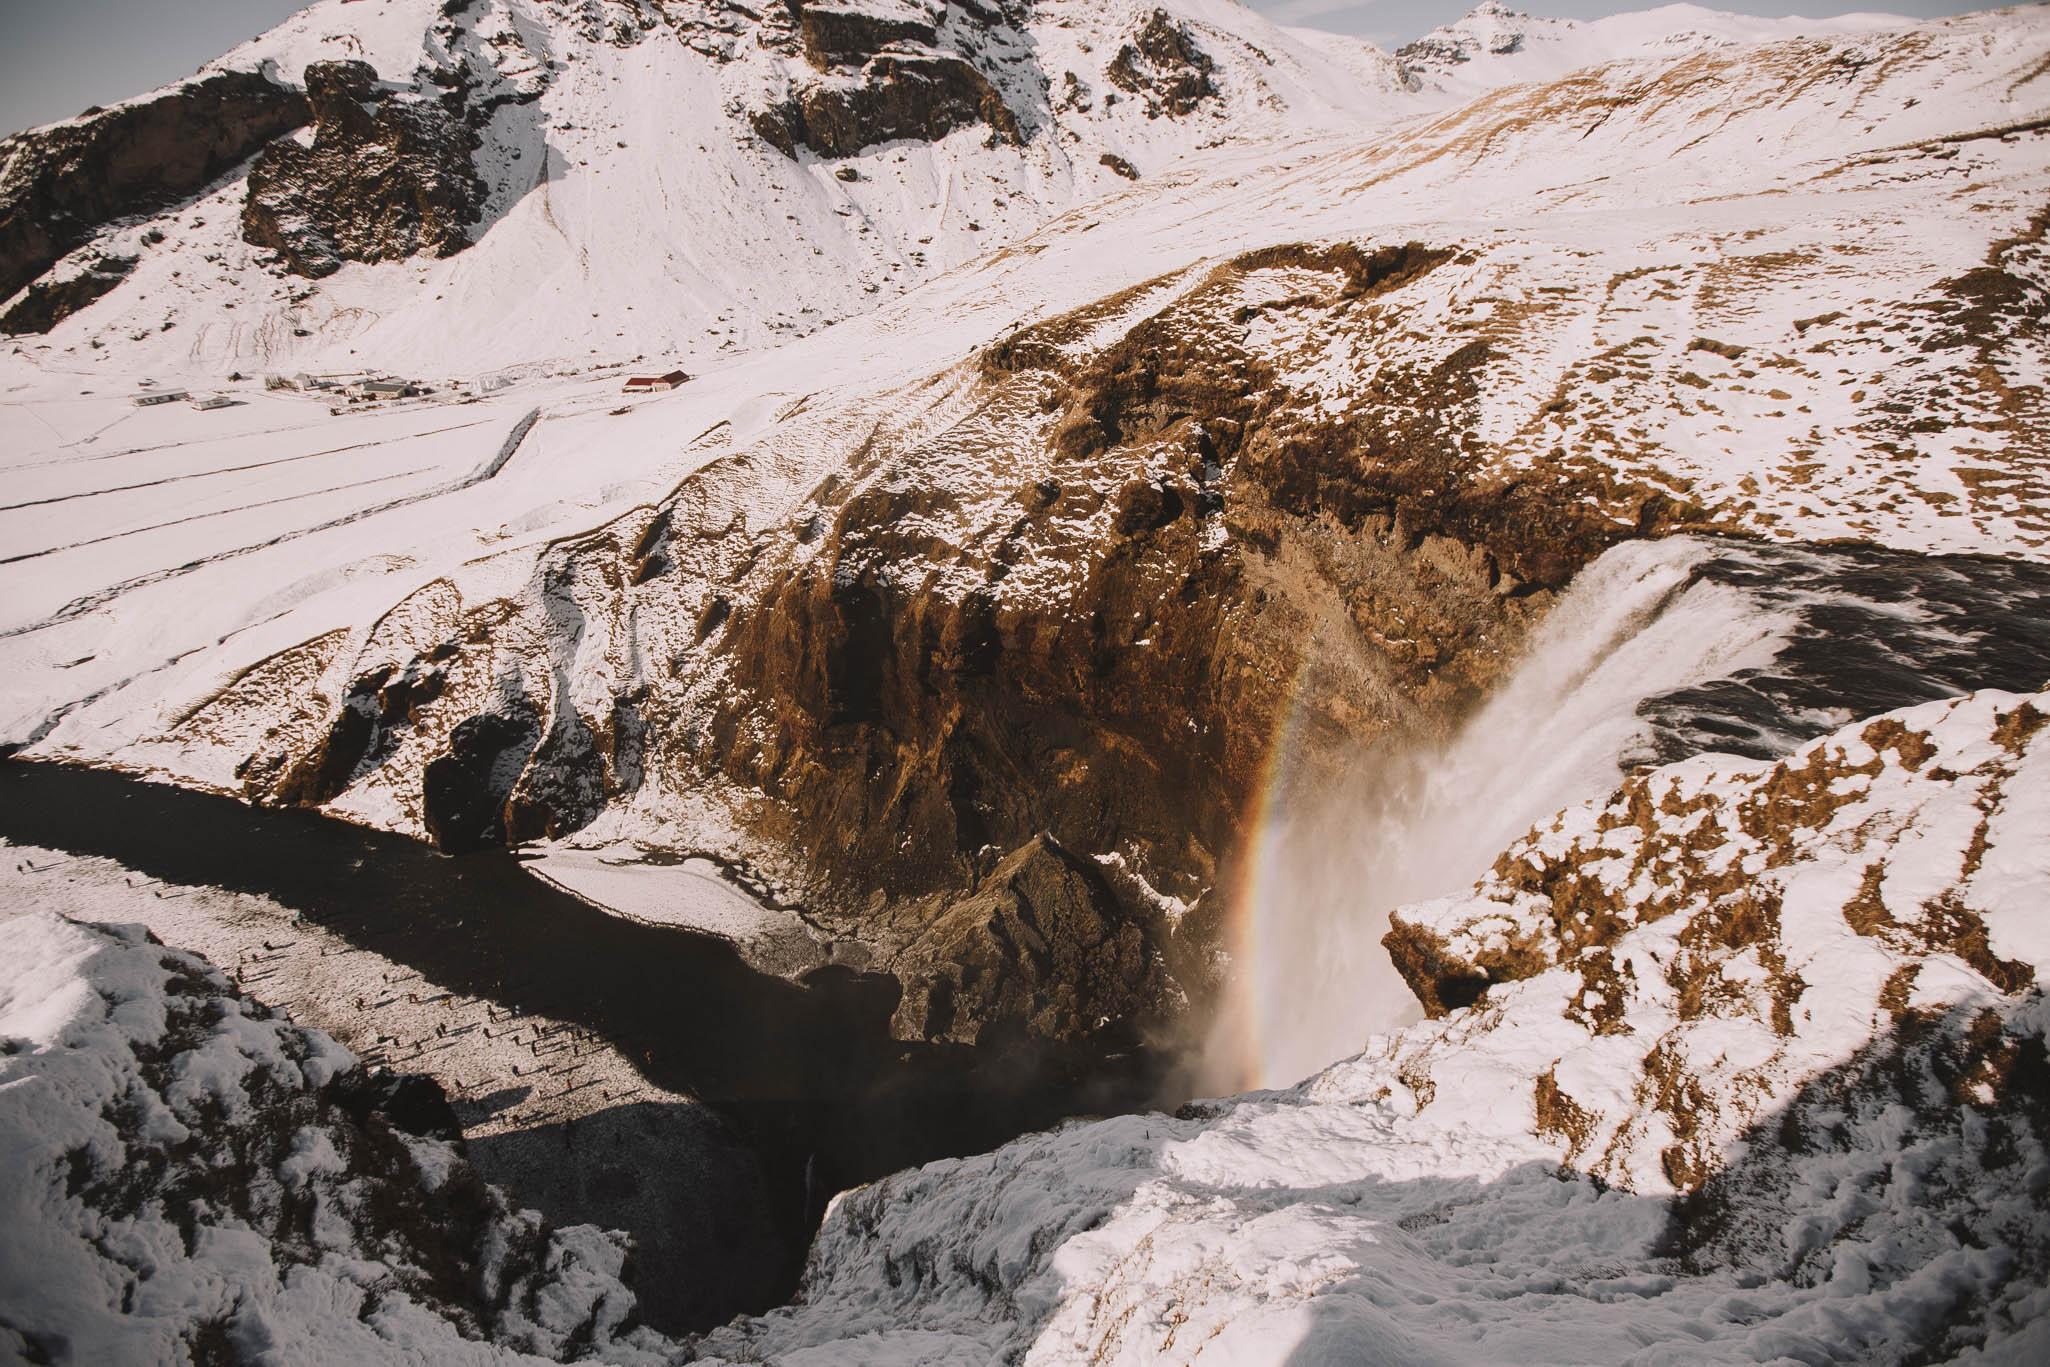 Road-trip-Islande-Iceland-Voyage-Travel-Portrait-Jérémy-Boyer-Sunny-day-Skogafoss-4.jpg